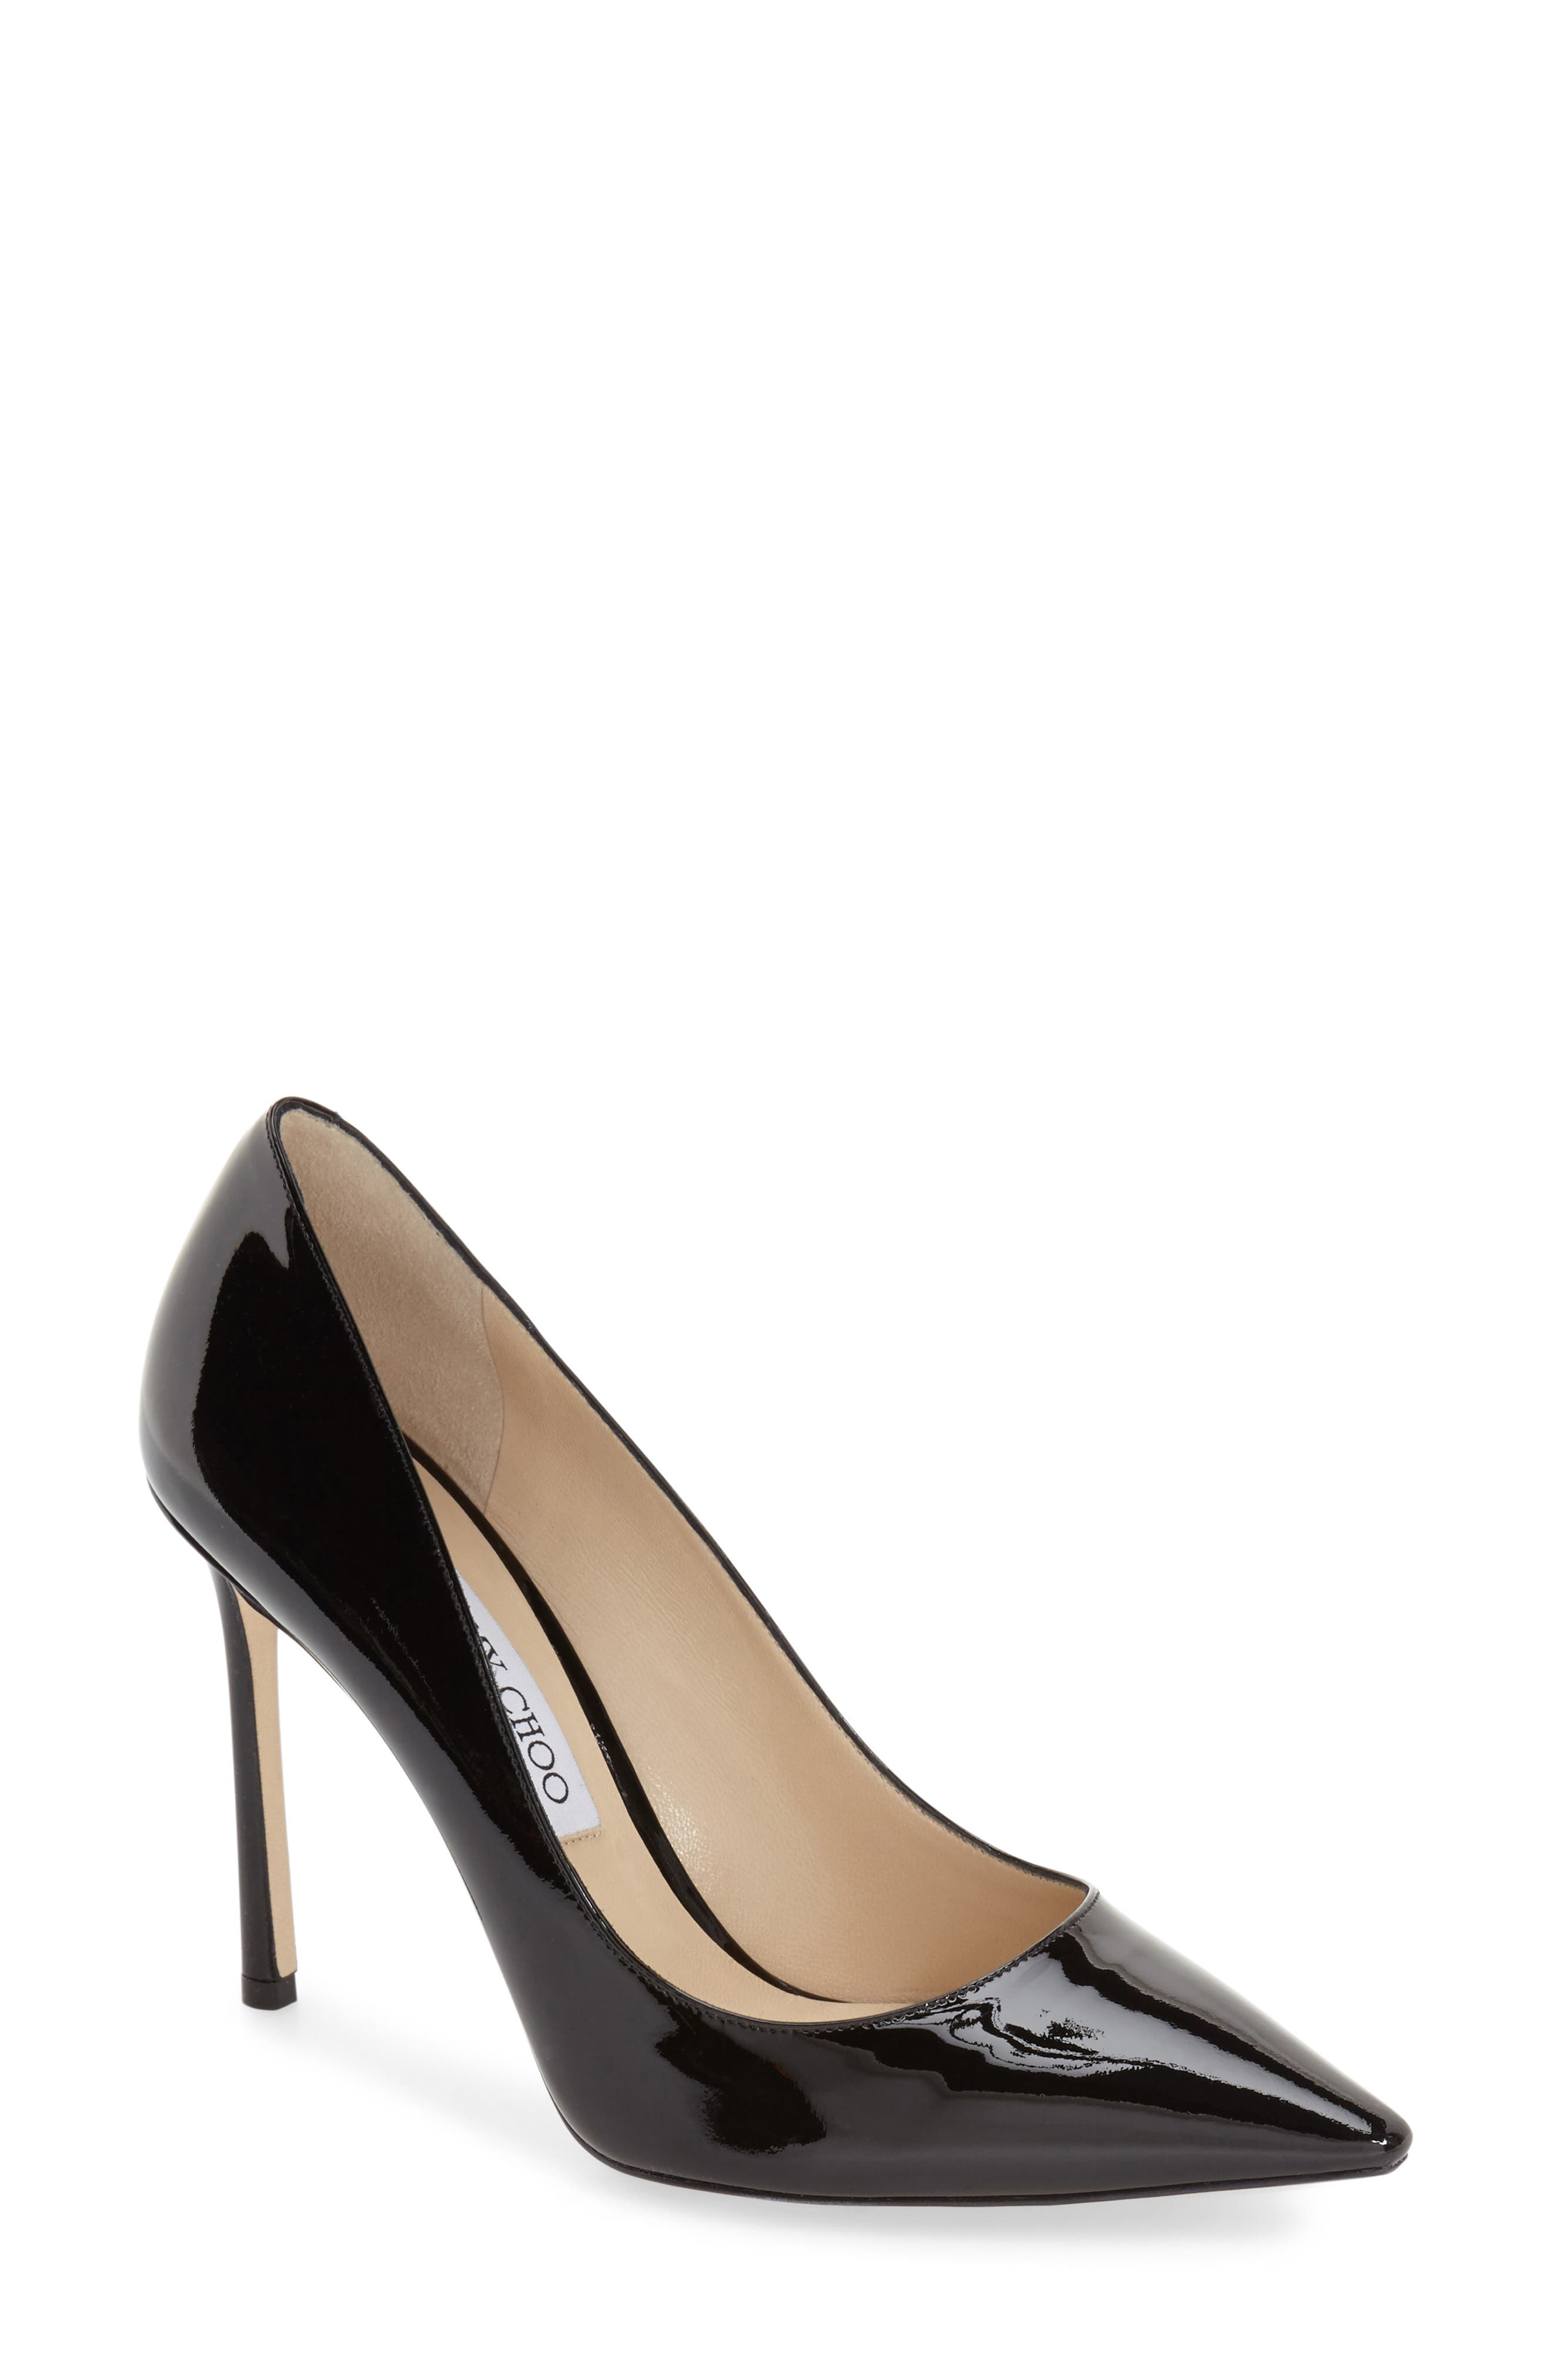 3926bfc6c3d Jimmy Choo Women s Shoes